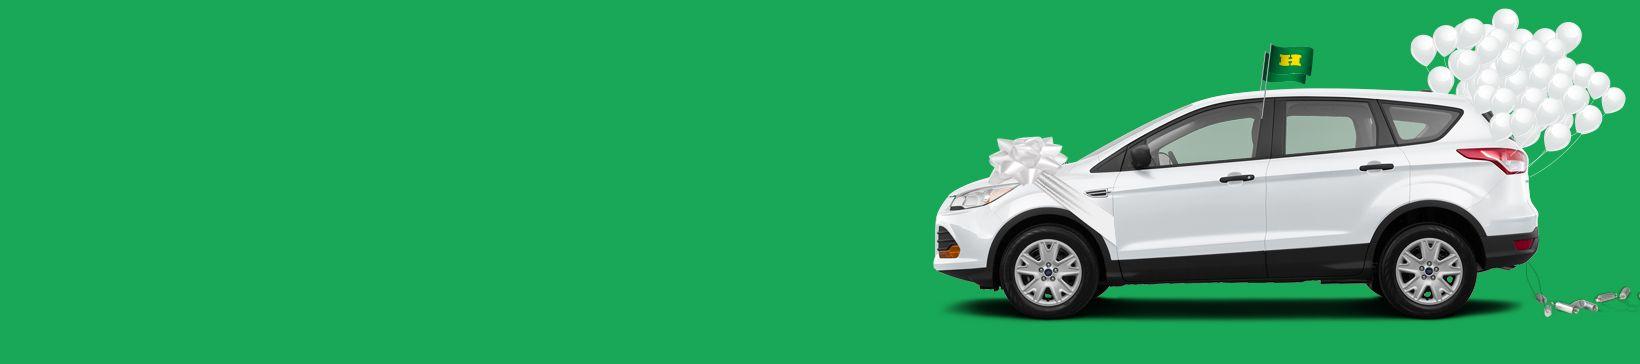 HG-1699-De¦ücor-ta-voiture-Blogue-14-Juin-2016